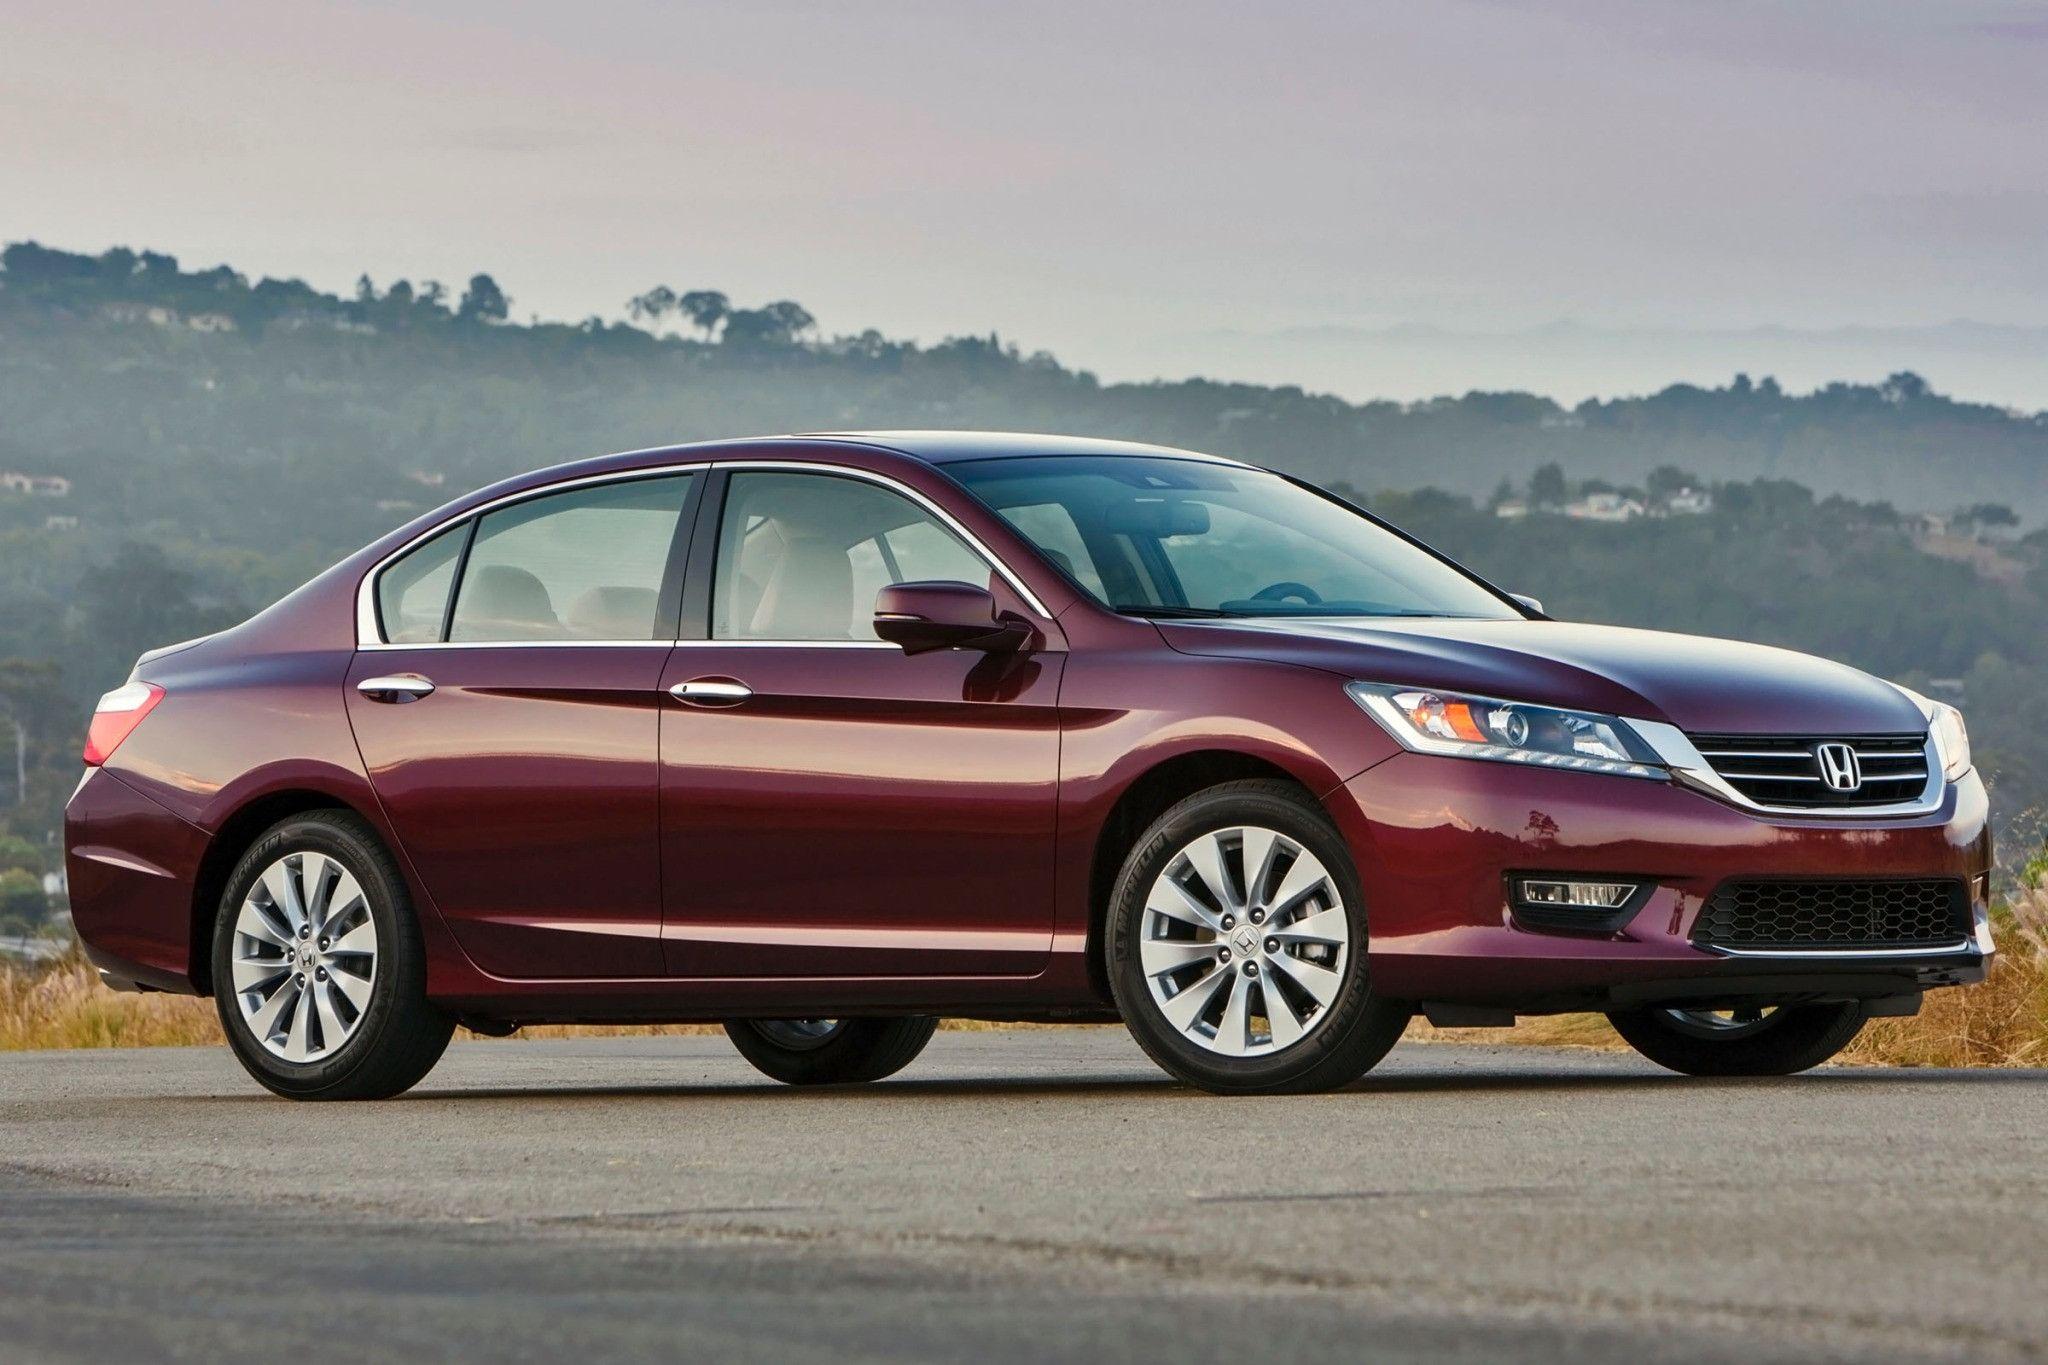 35 Honda Odyssey Lease Price Xe3m di 2020